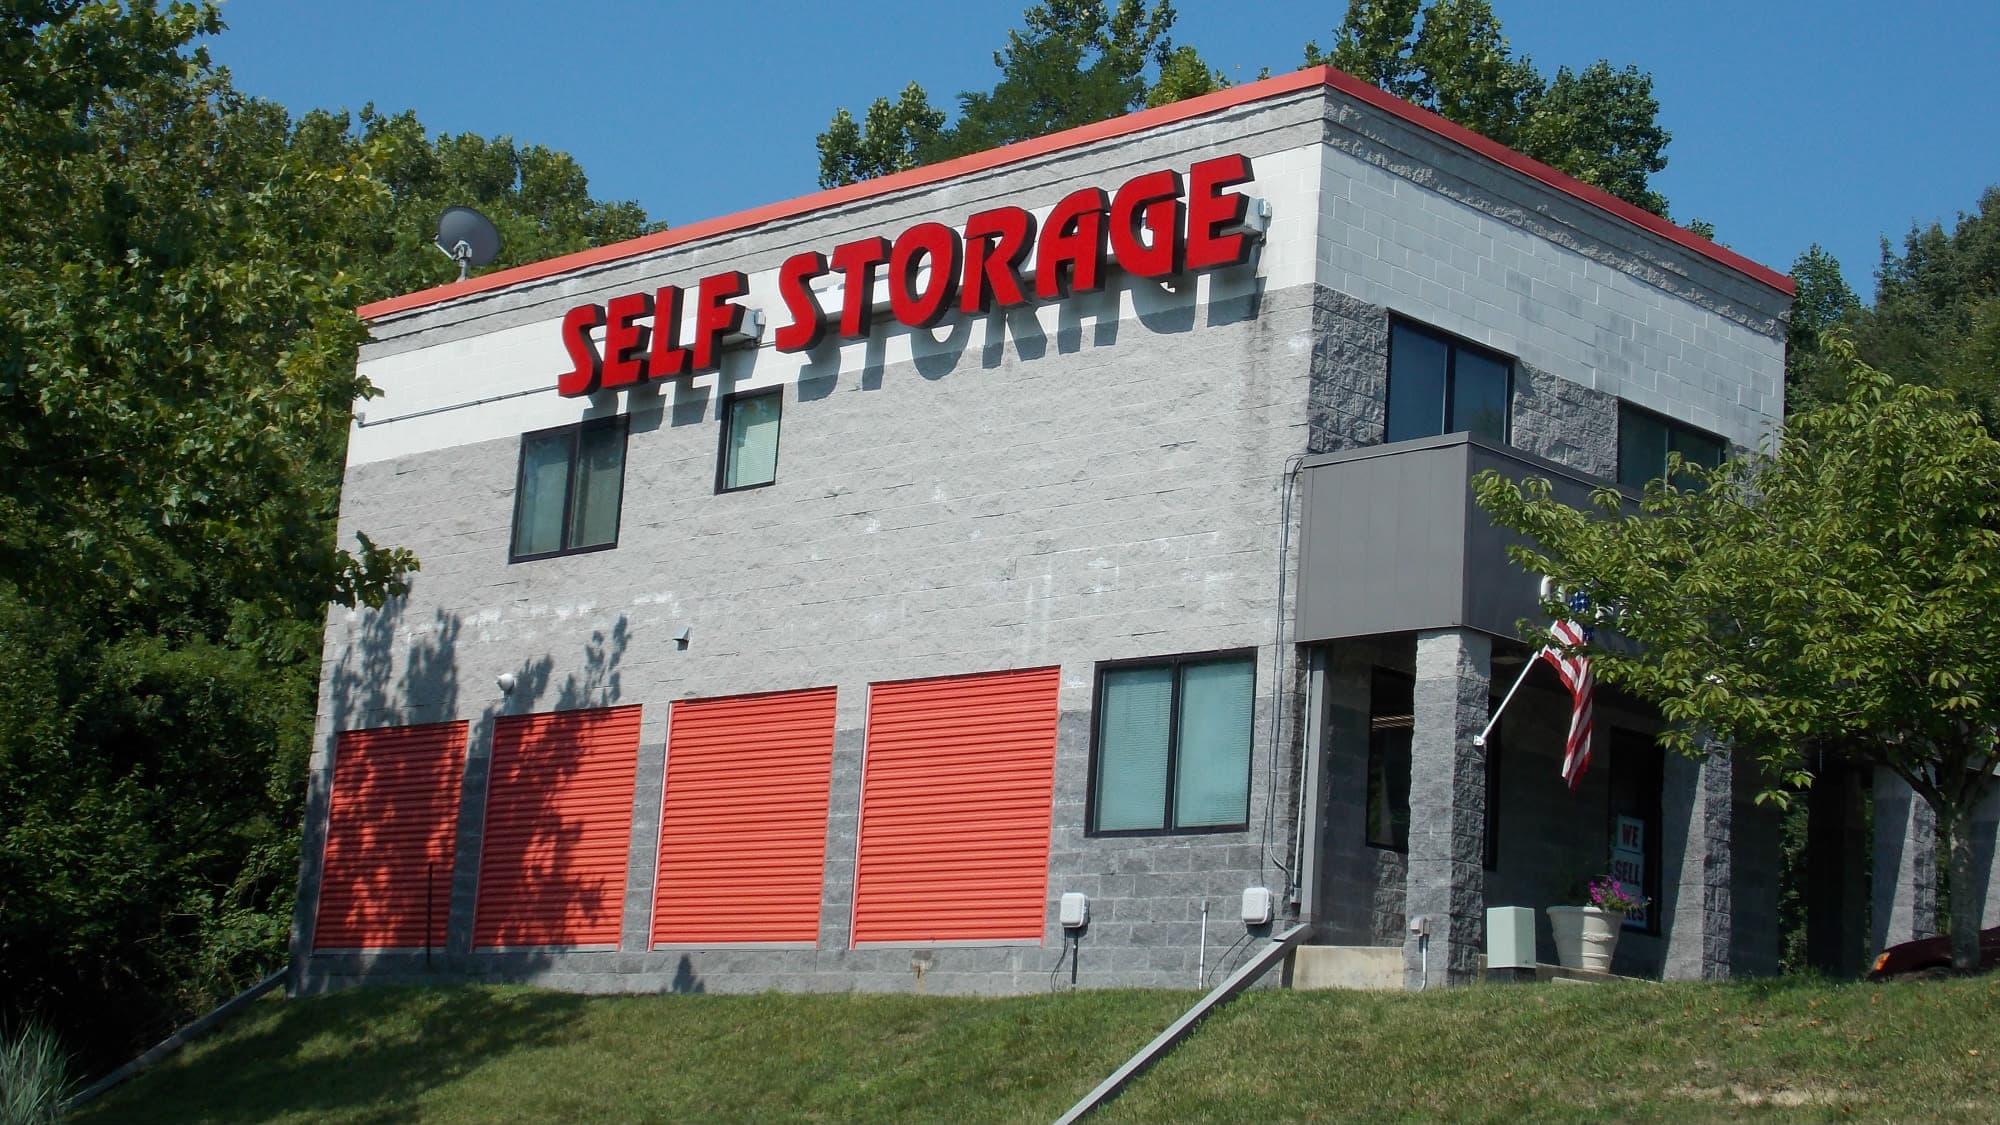 Exterior of Freestate Self Storage in Laurel, Maryland